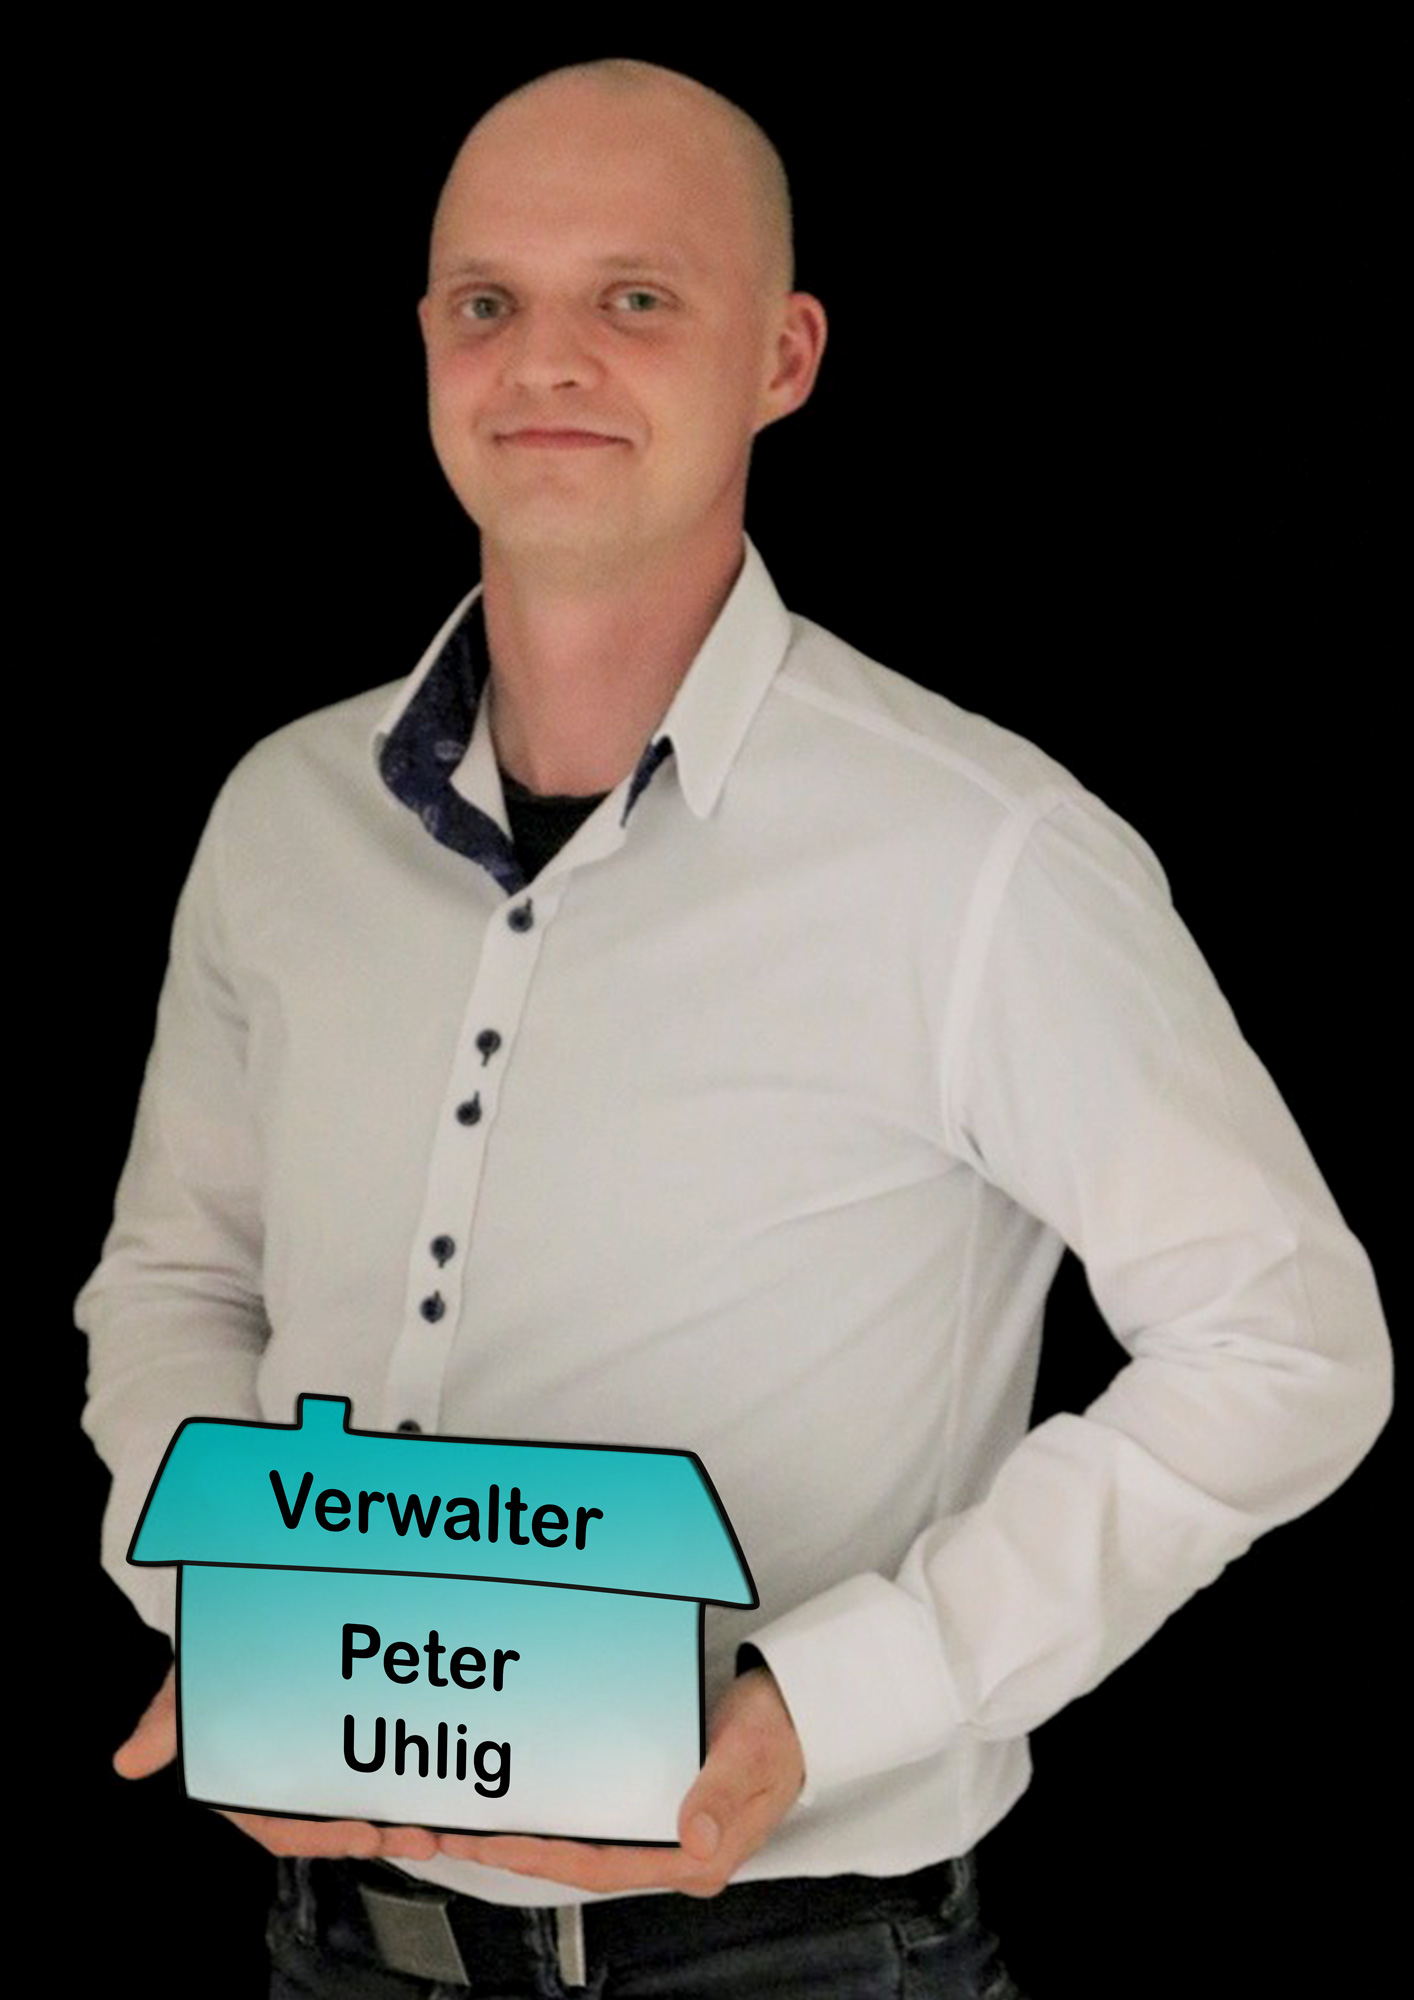 Peter Uhlig